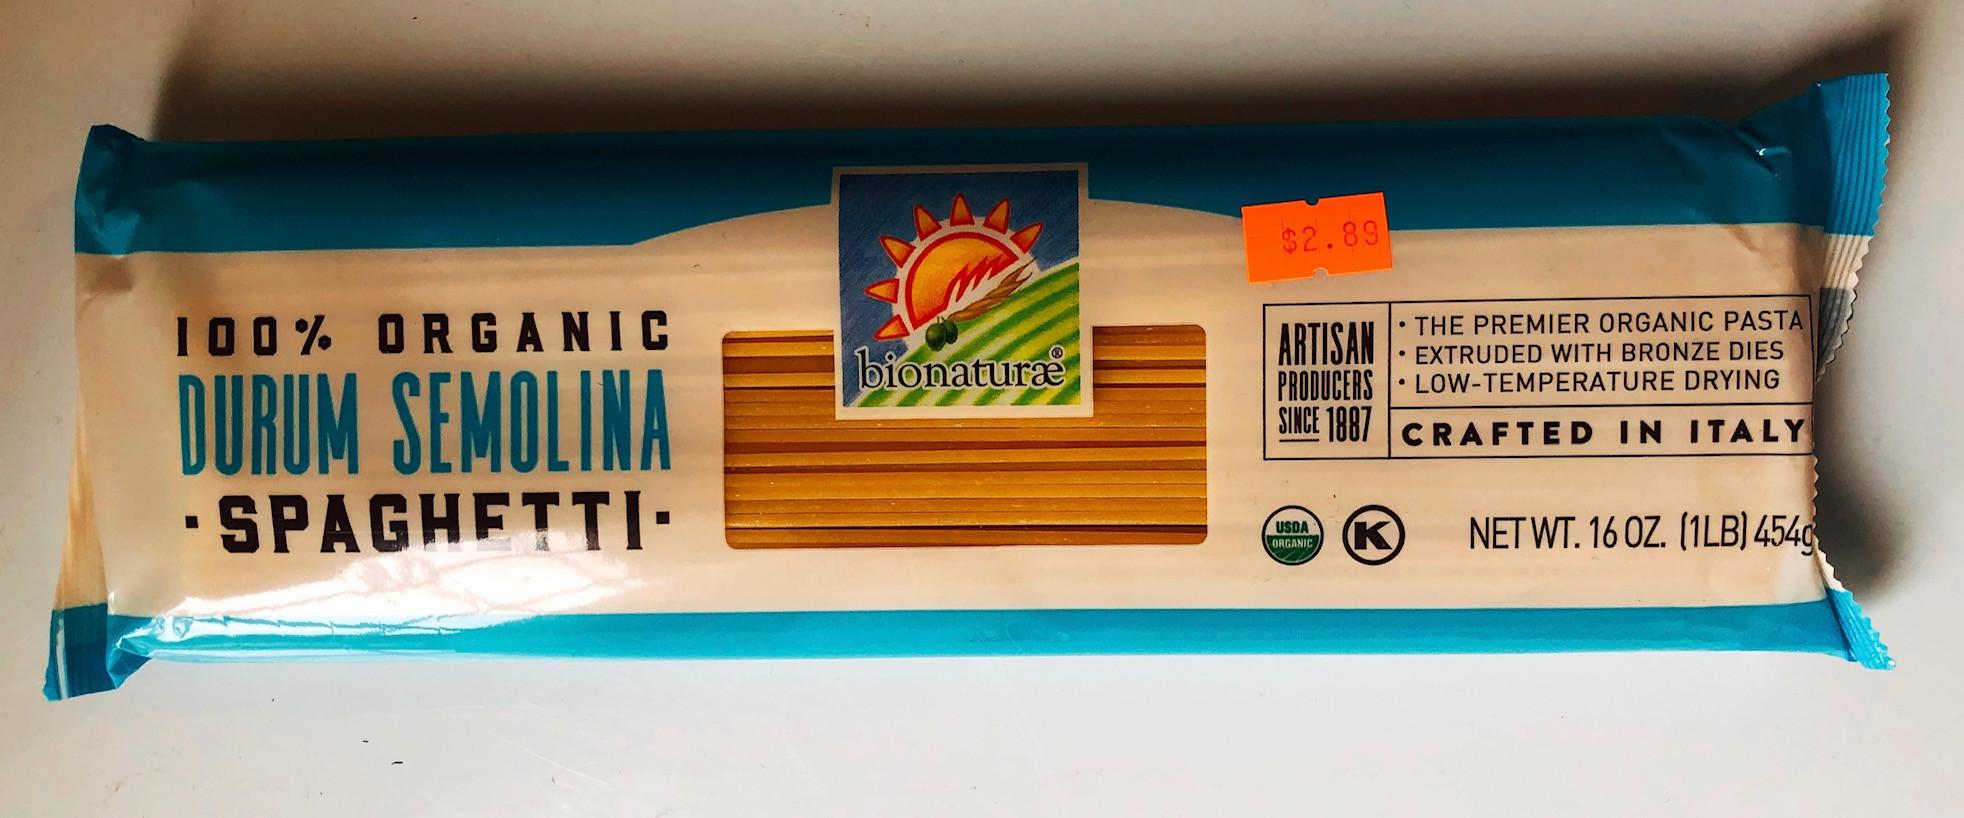 Bionaturae - Organic Spaghetti